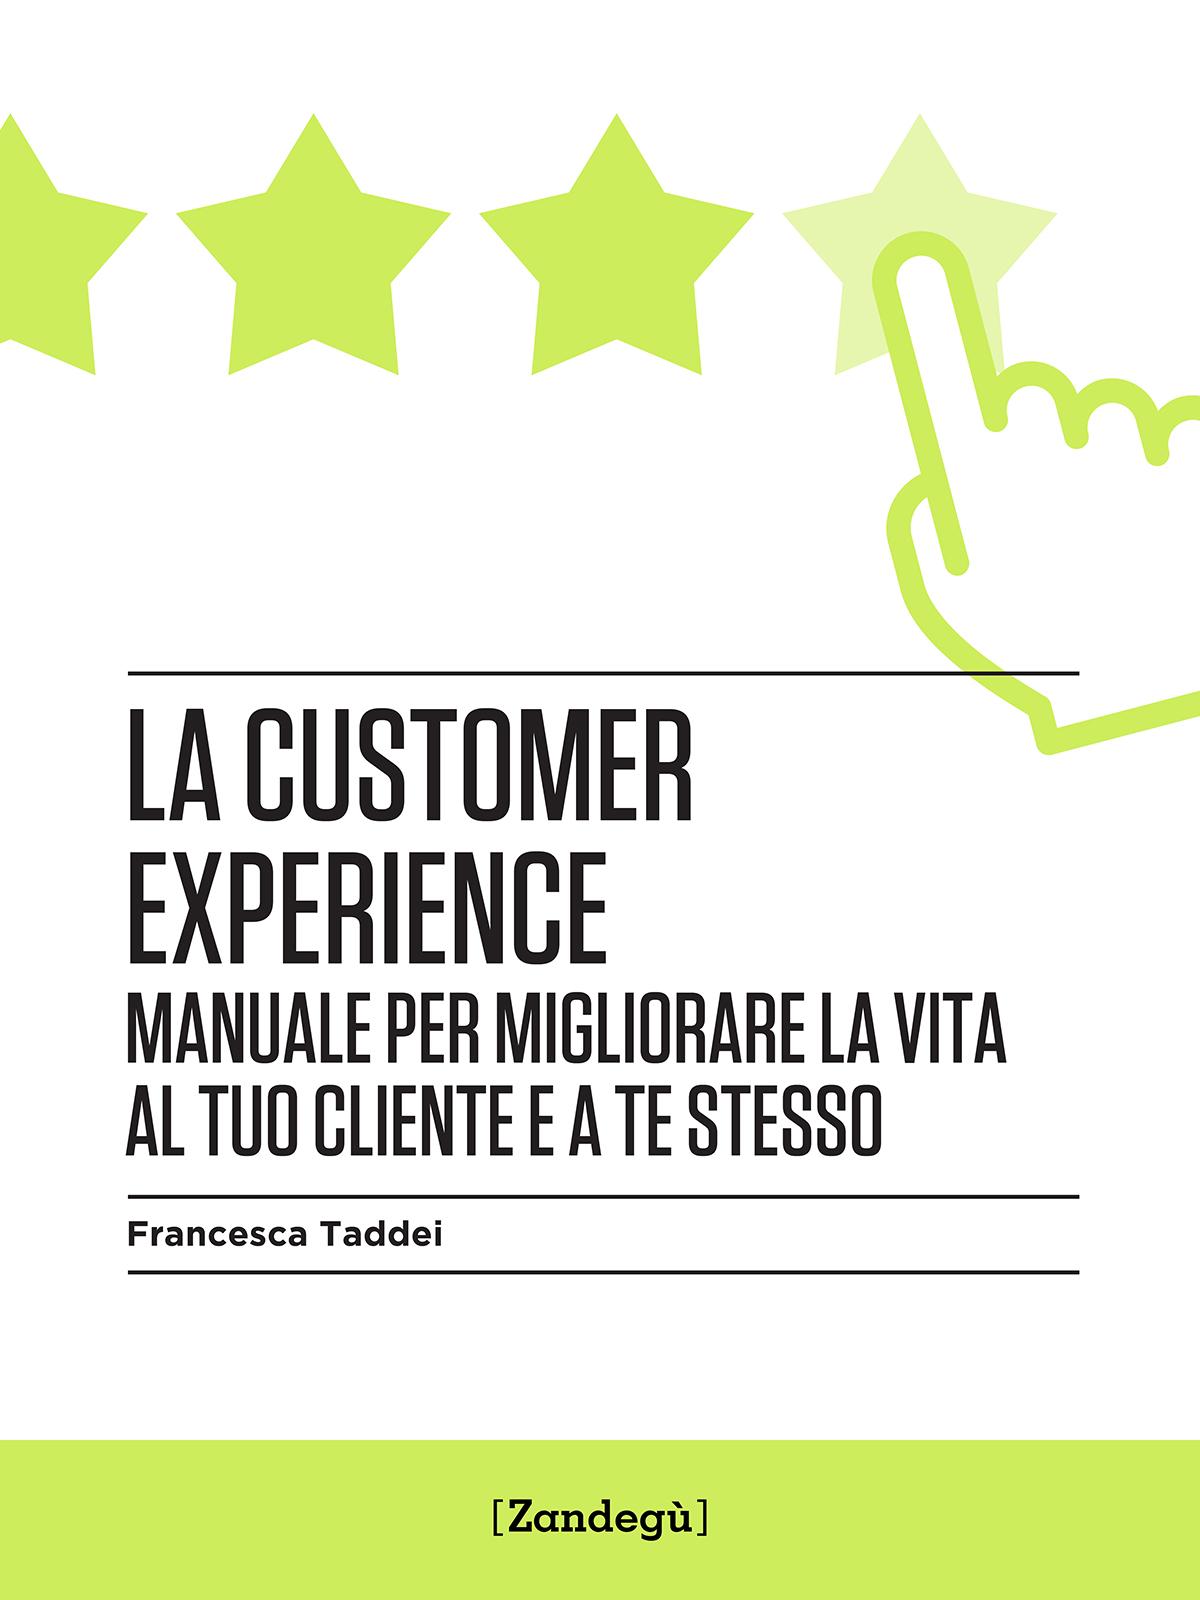 La customer experience